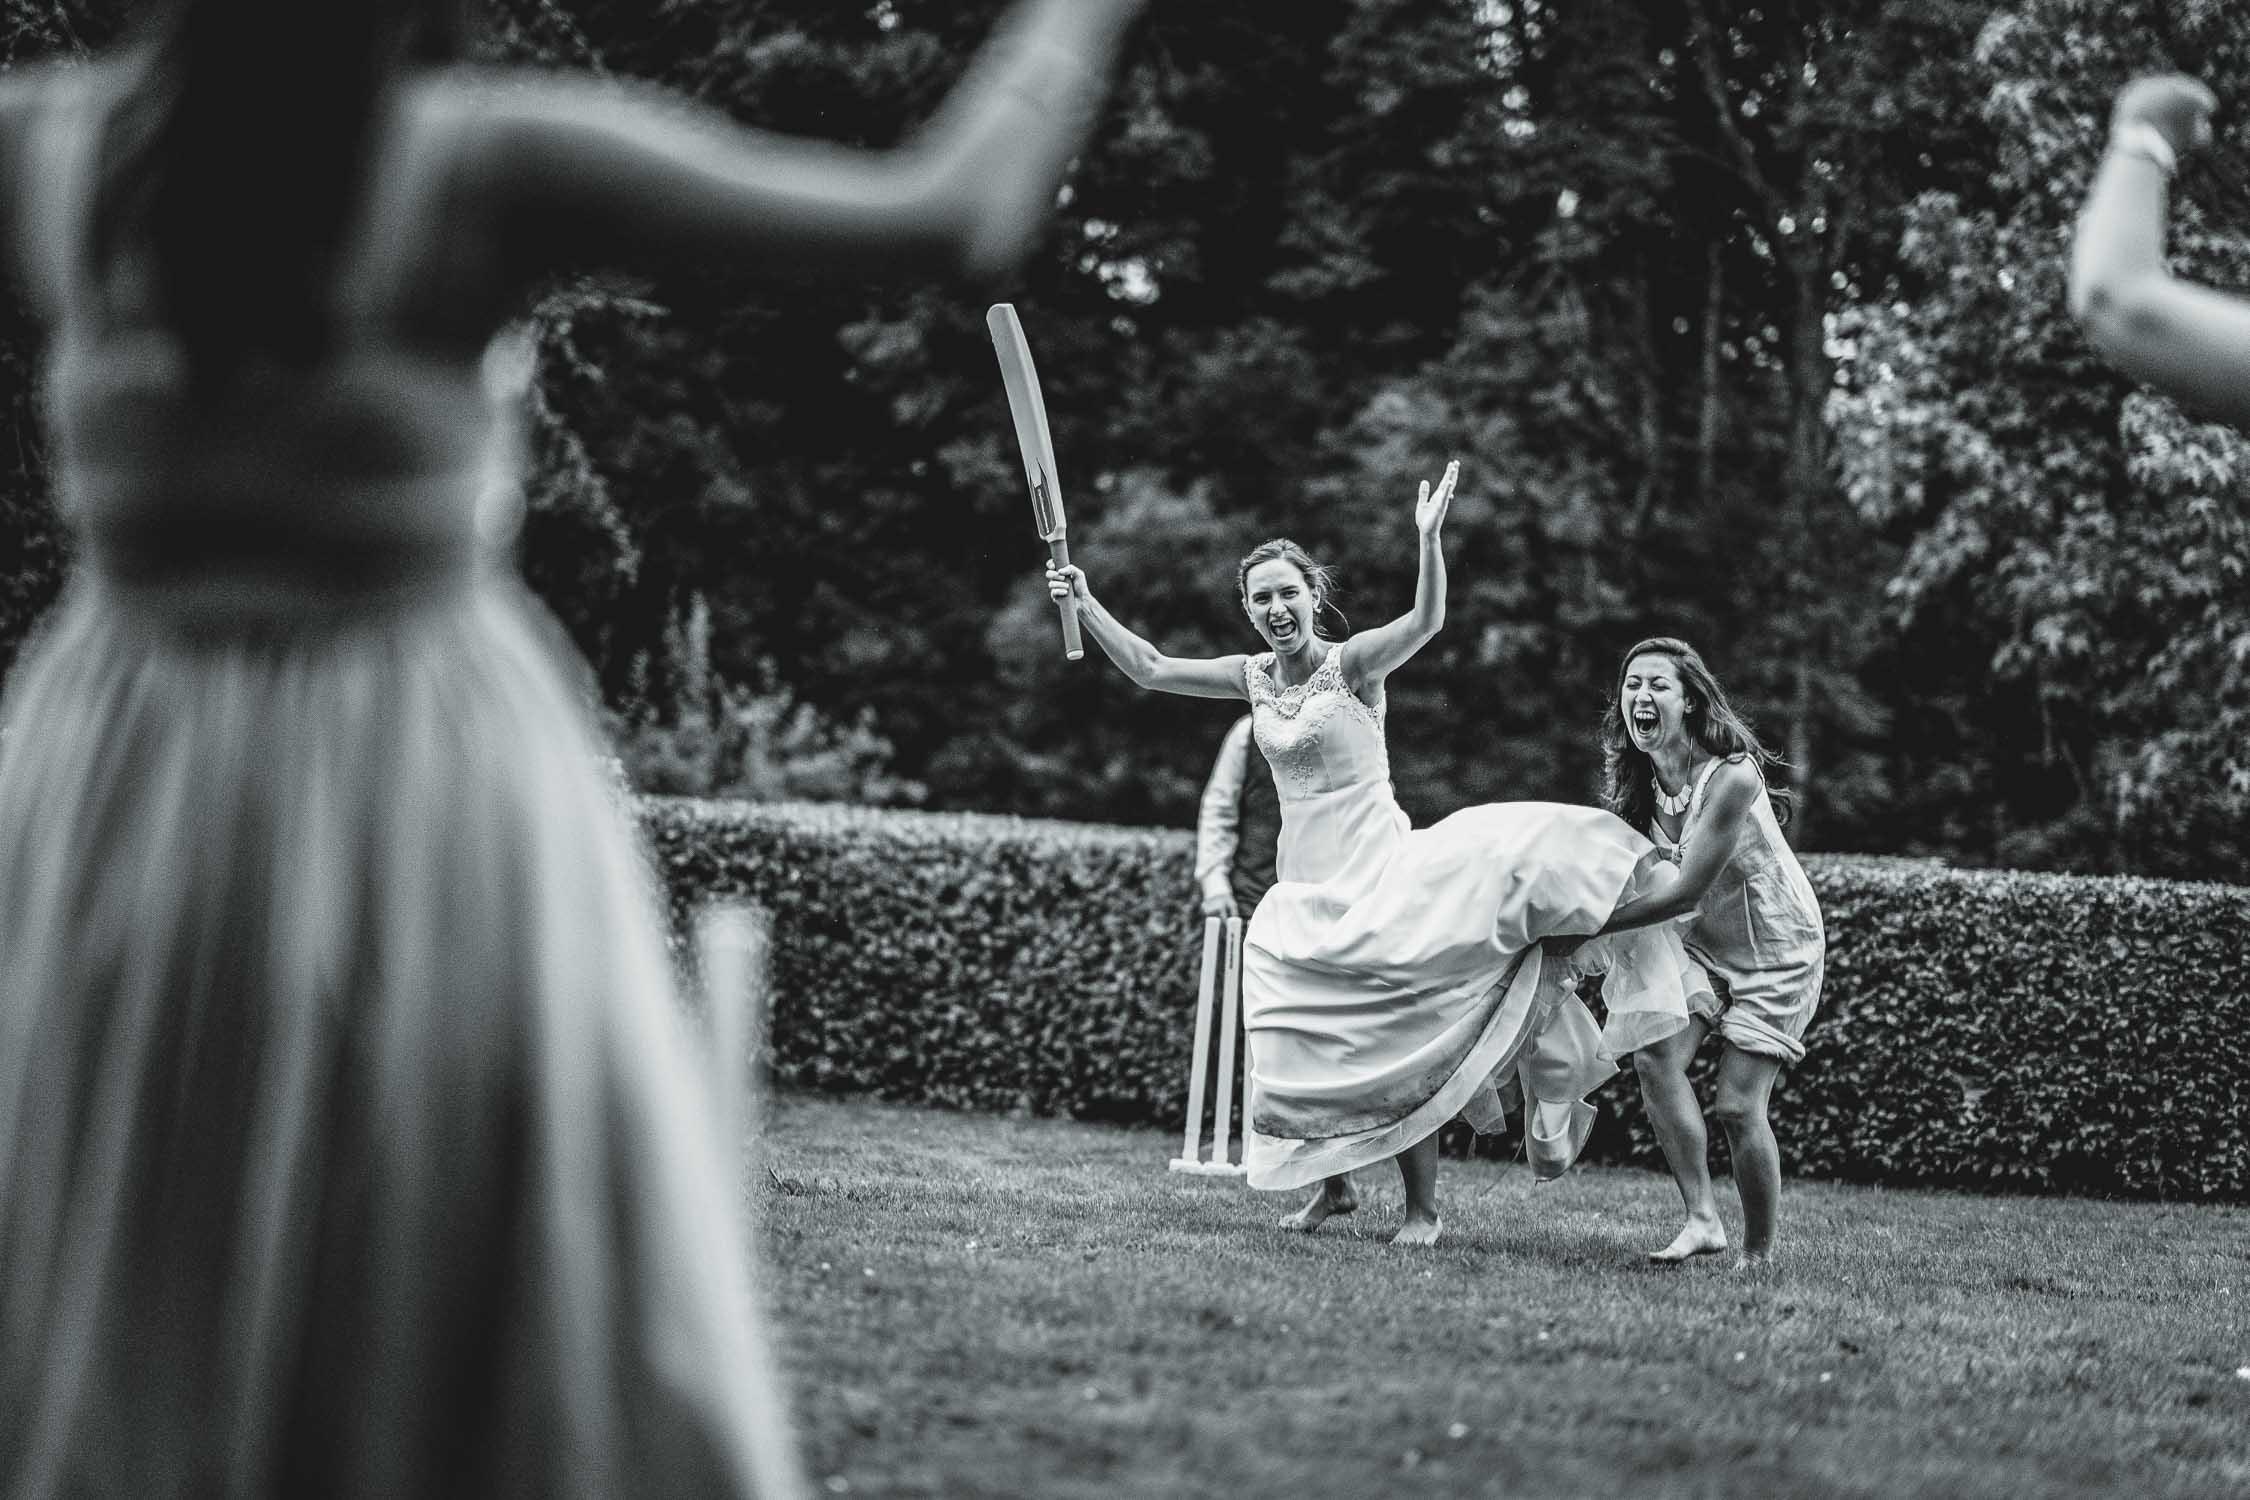 Helens Manor Herefordshire, Helens Manor Wedding Photographer, Wedding photography at Helens manor, Herefordshire, Wedding, Photographer